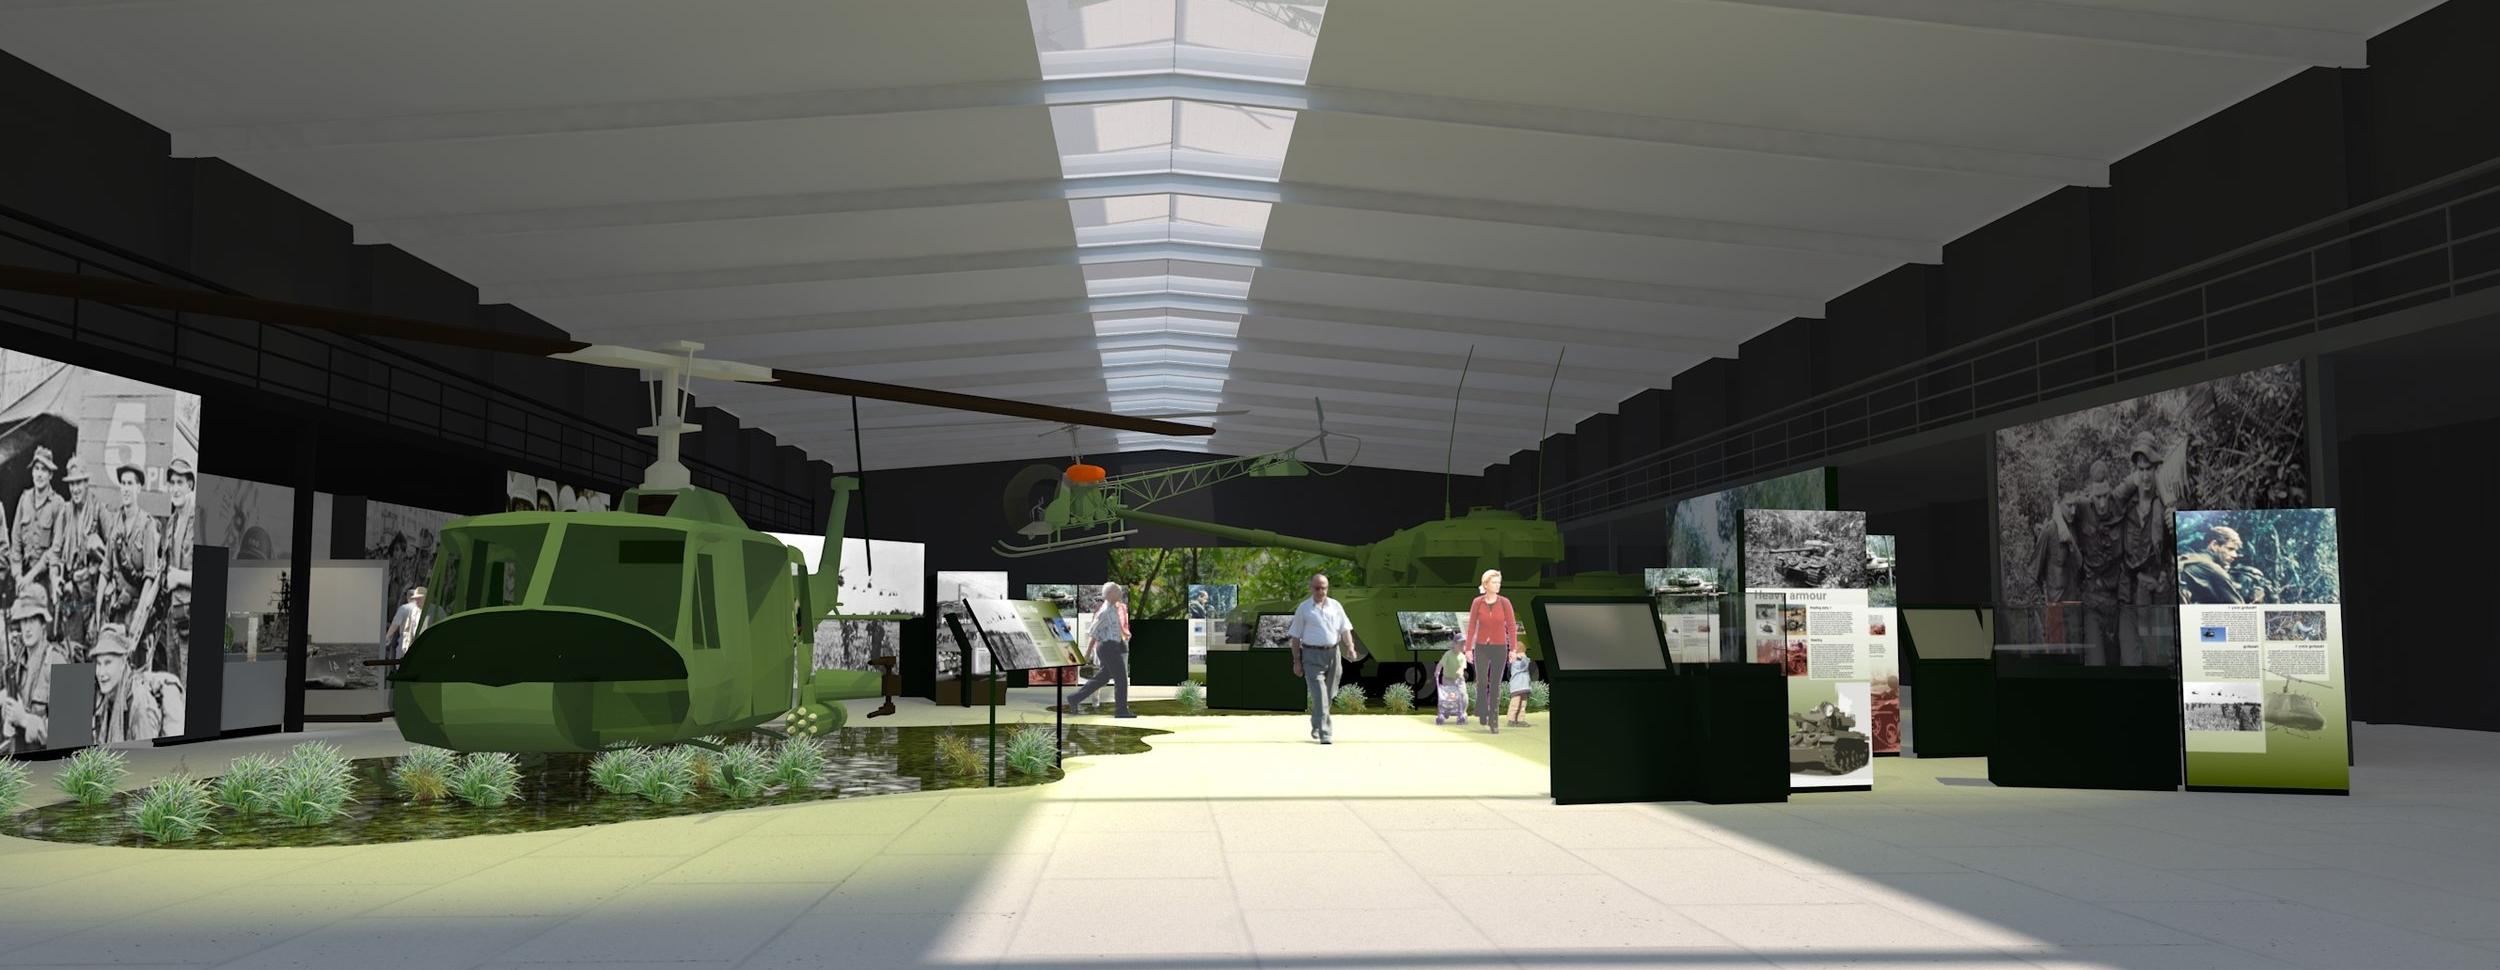 Master plan for the National Vietnam Veterans Museum